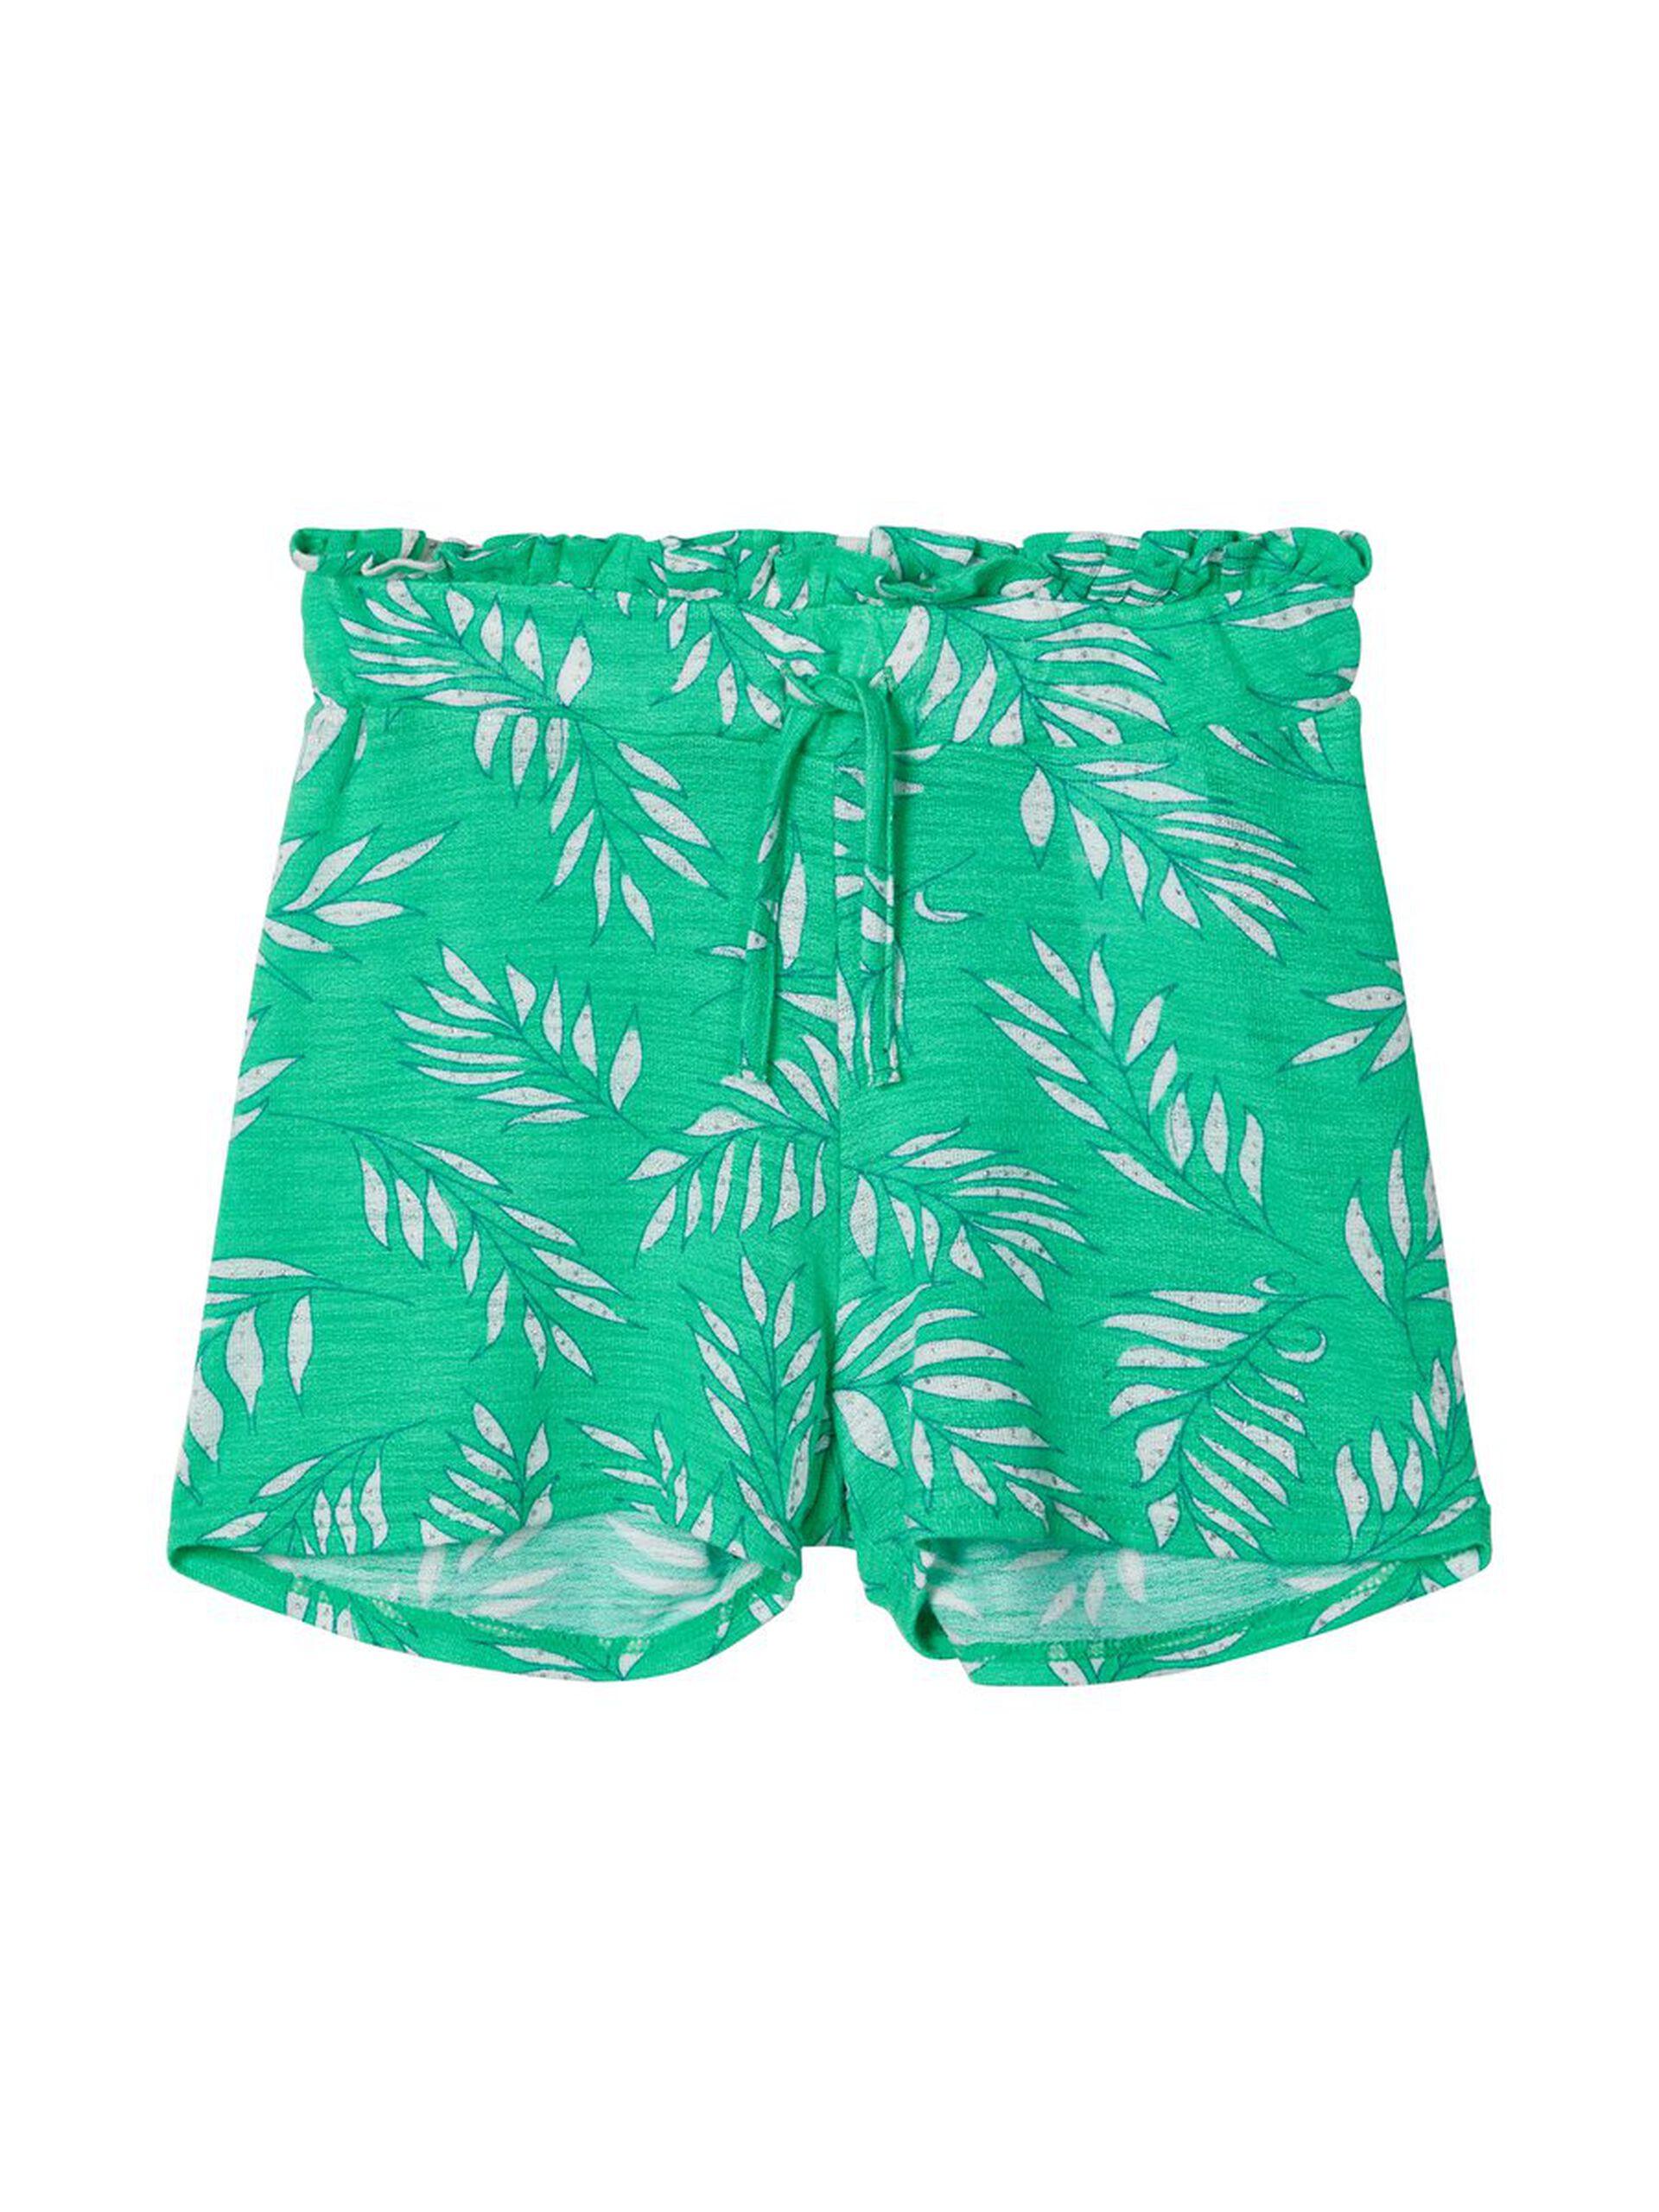 Grønn shorts Jiselle